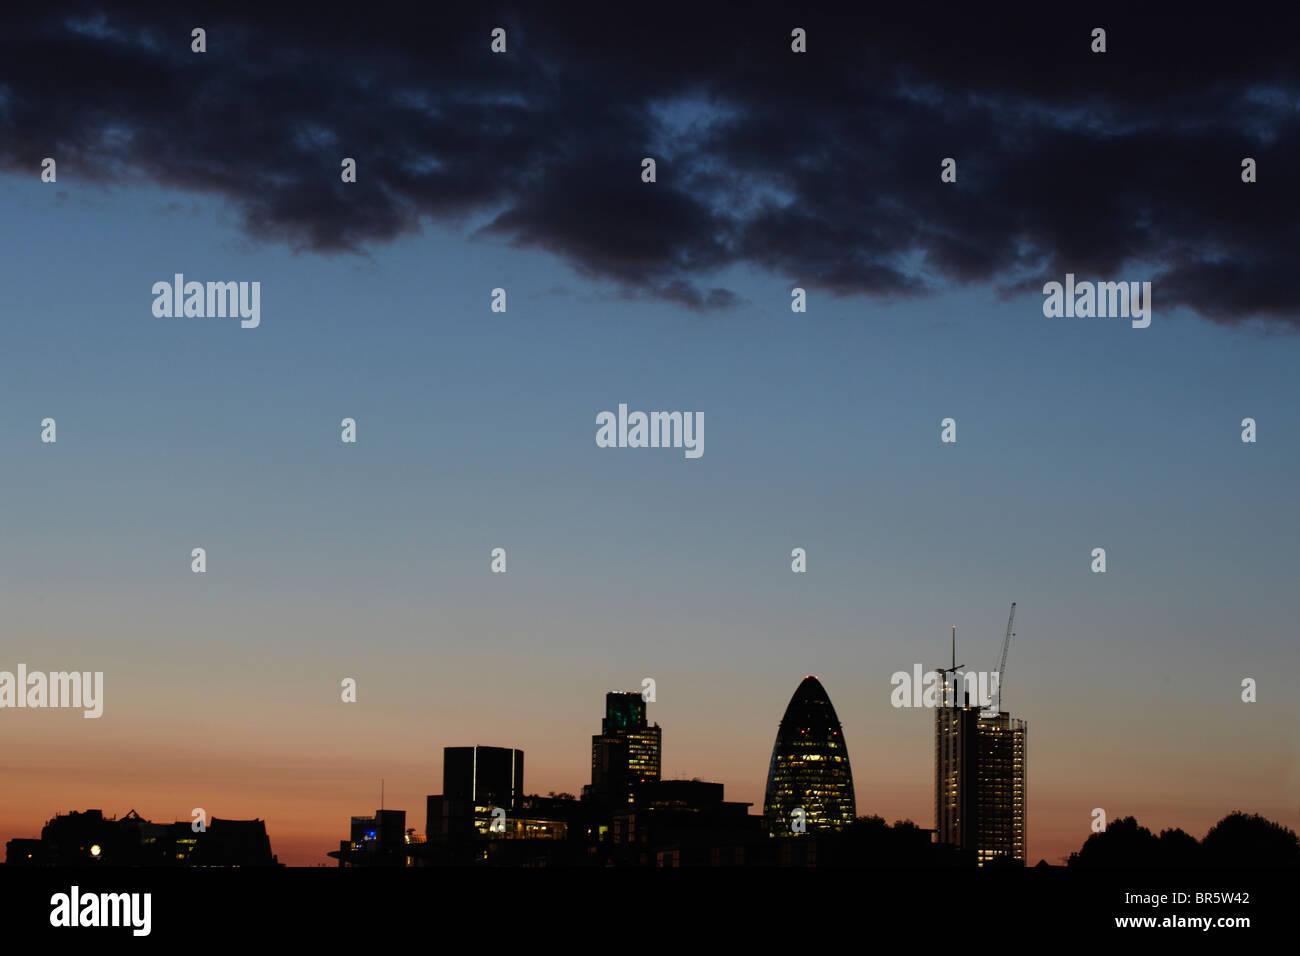 City of London at Night - Stock Image